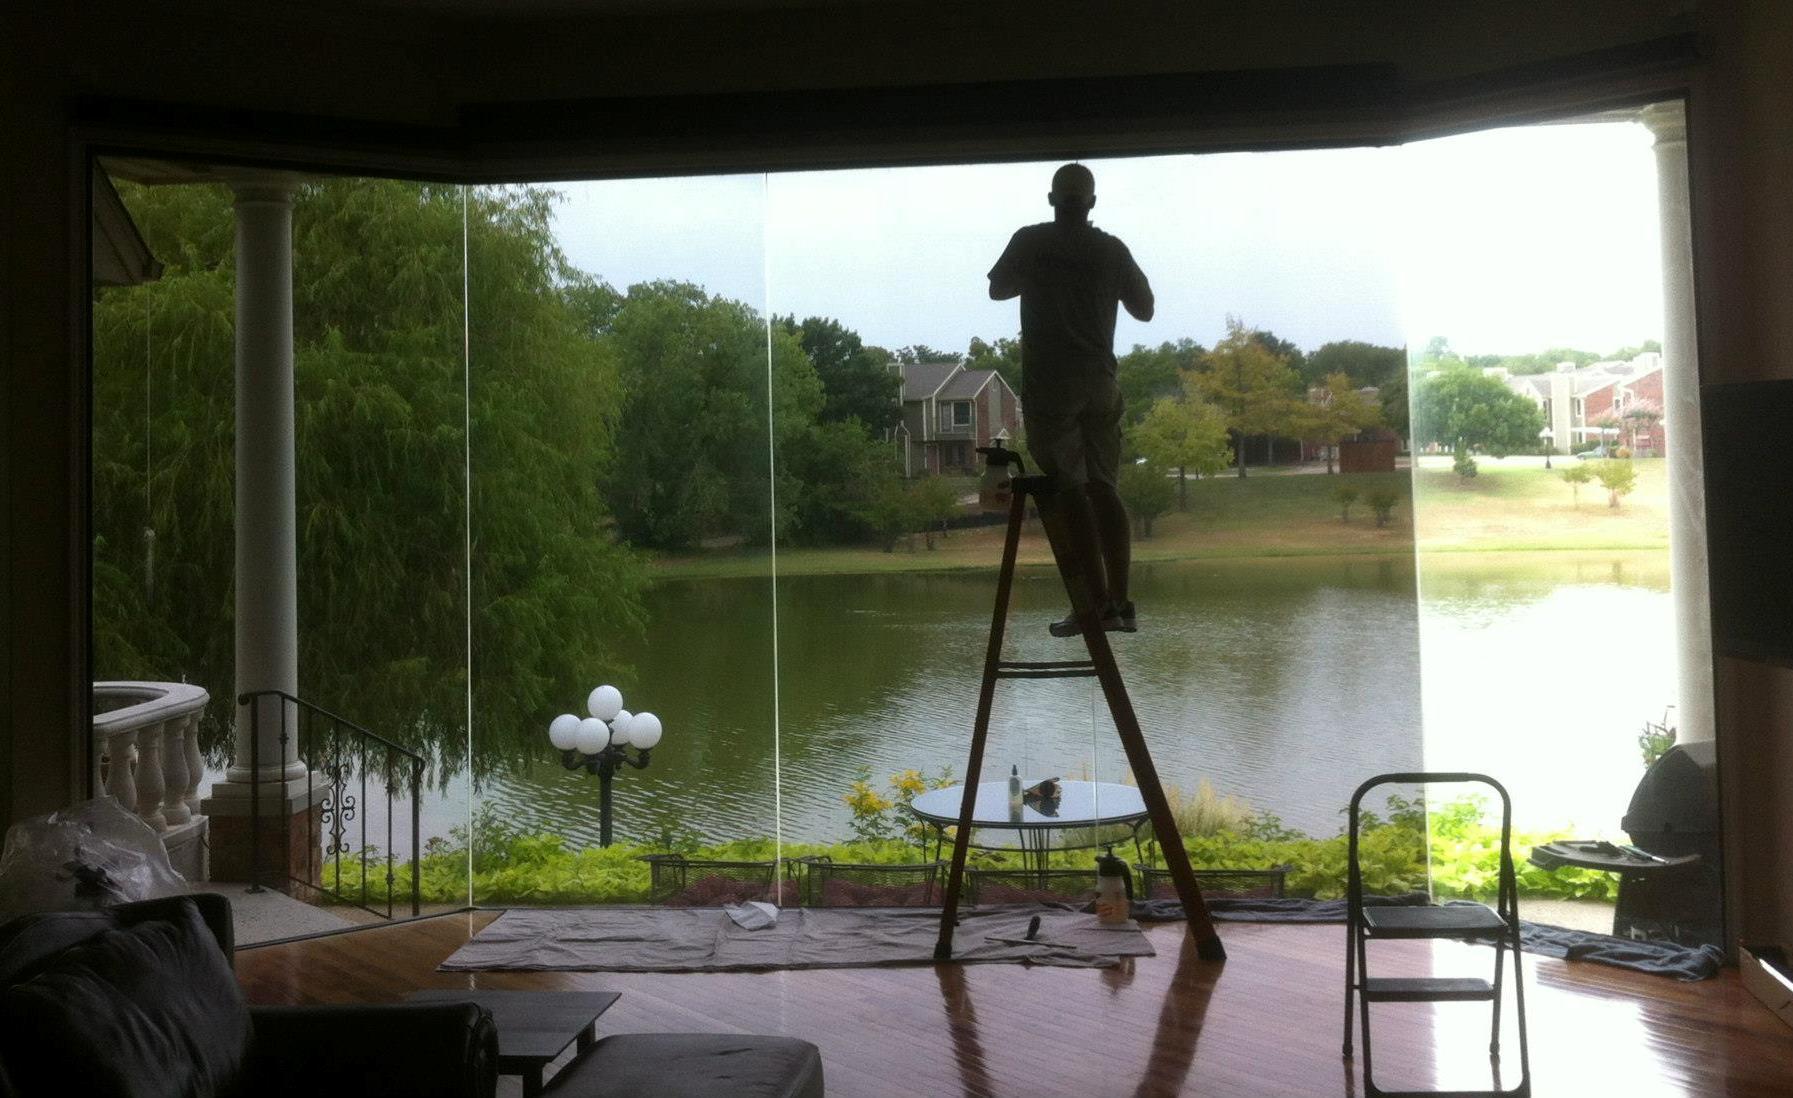 window genie installs privacy window film adding to local. Black Bedroom Furniture Sets. Home Design Ideas